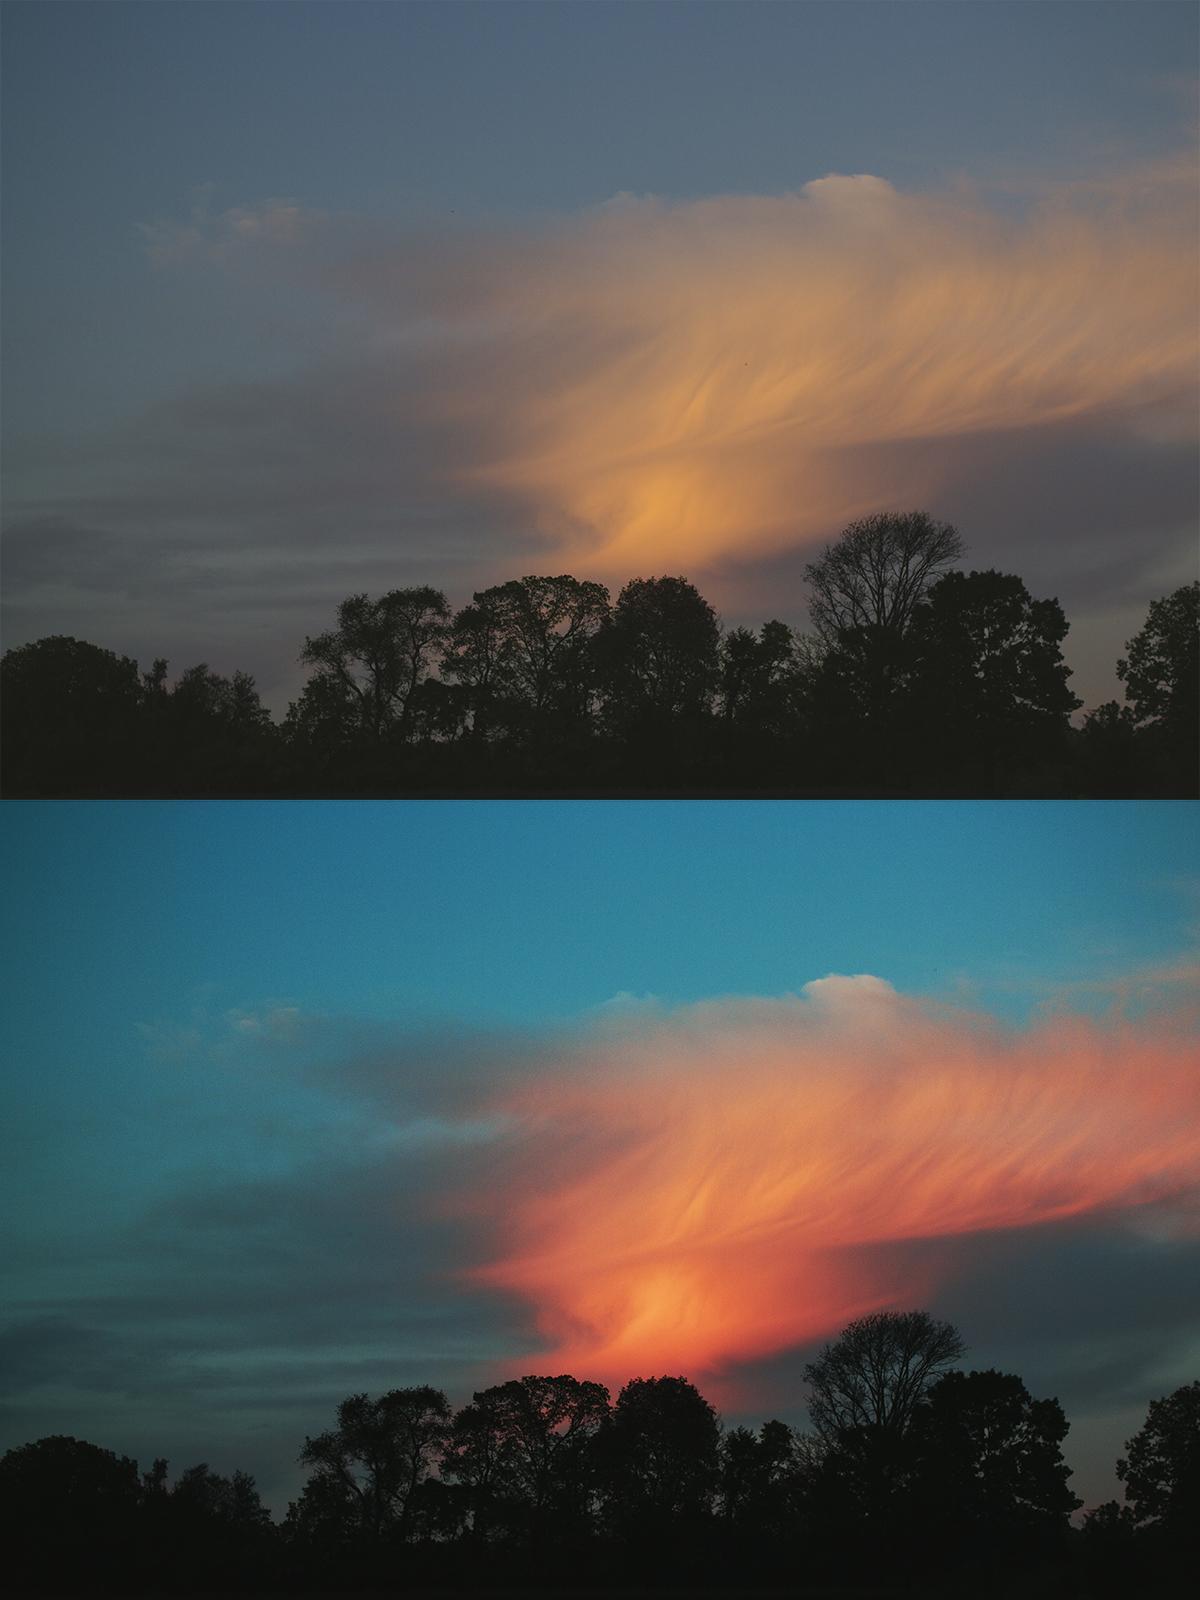 sky example.jpg